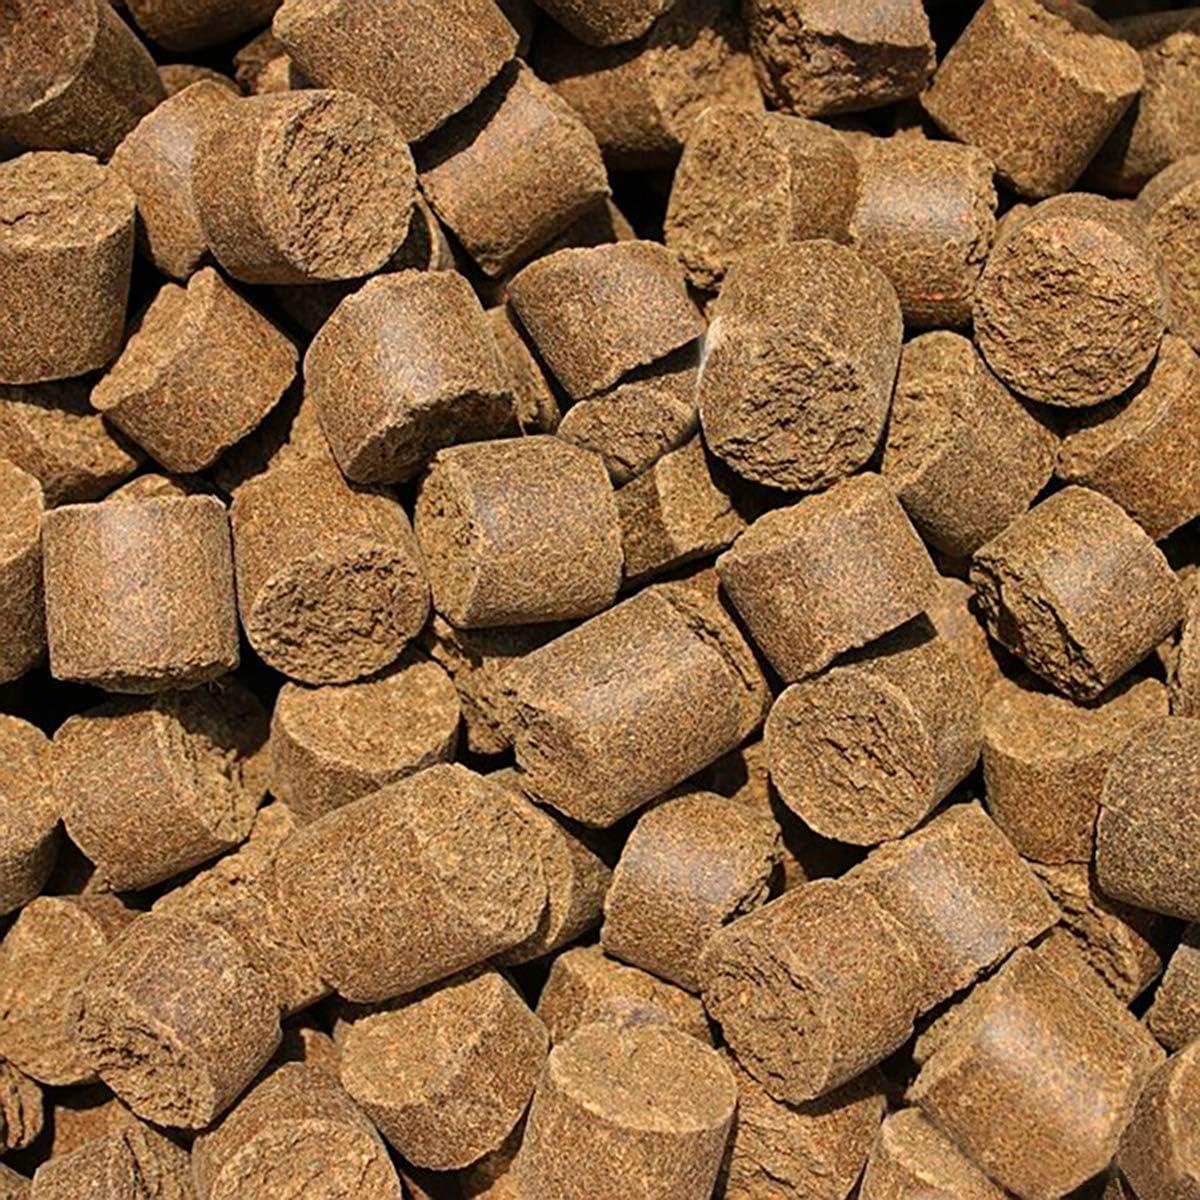 LKXHarleya 150g Organic Fertilizer Japanese Bonsai Fertilizer - Long Lasting & High Efficiency Plant Food Compost Promoting Fertility